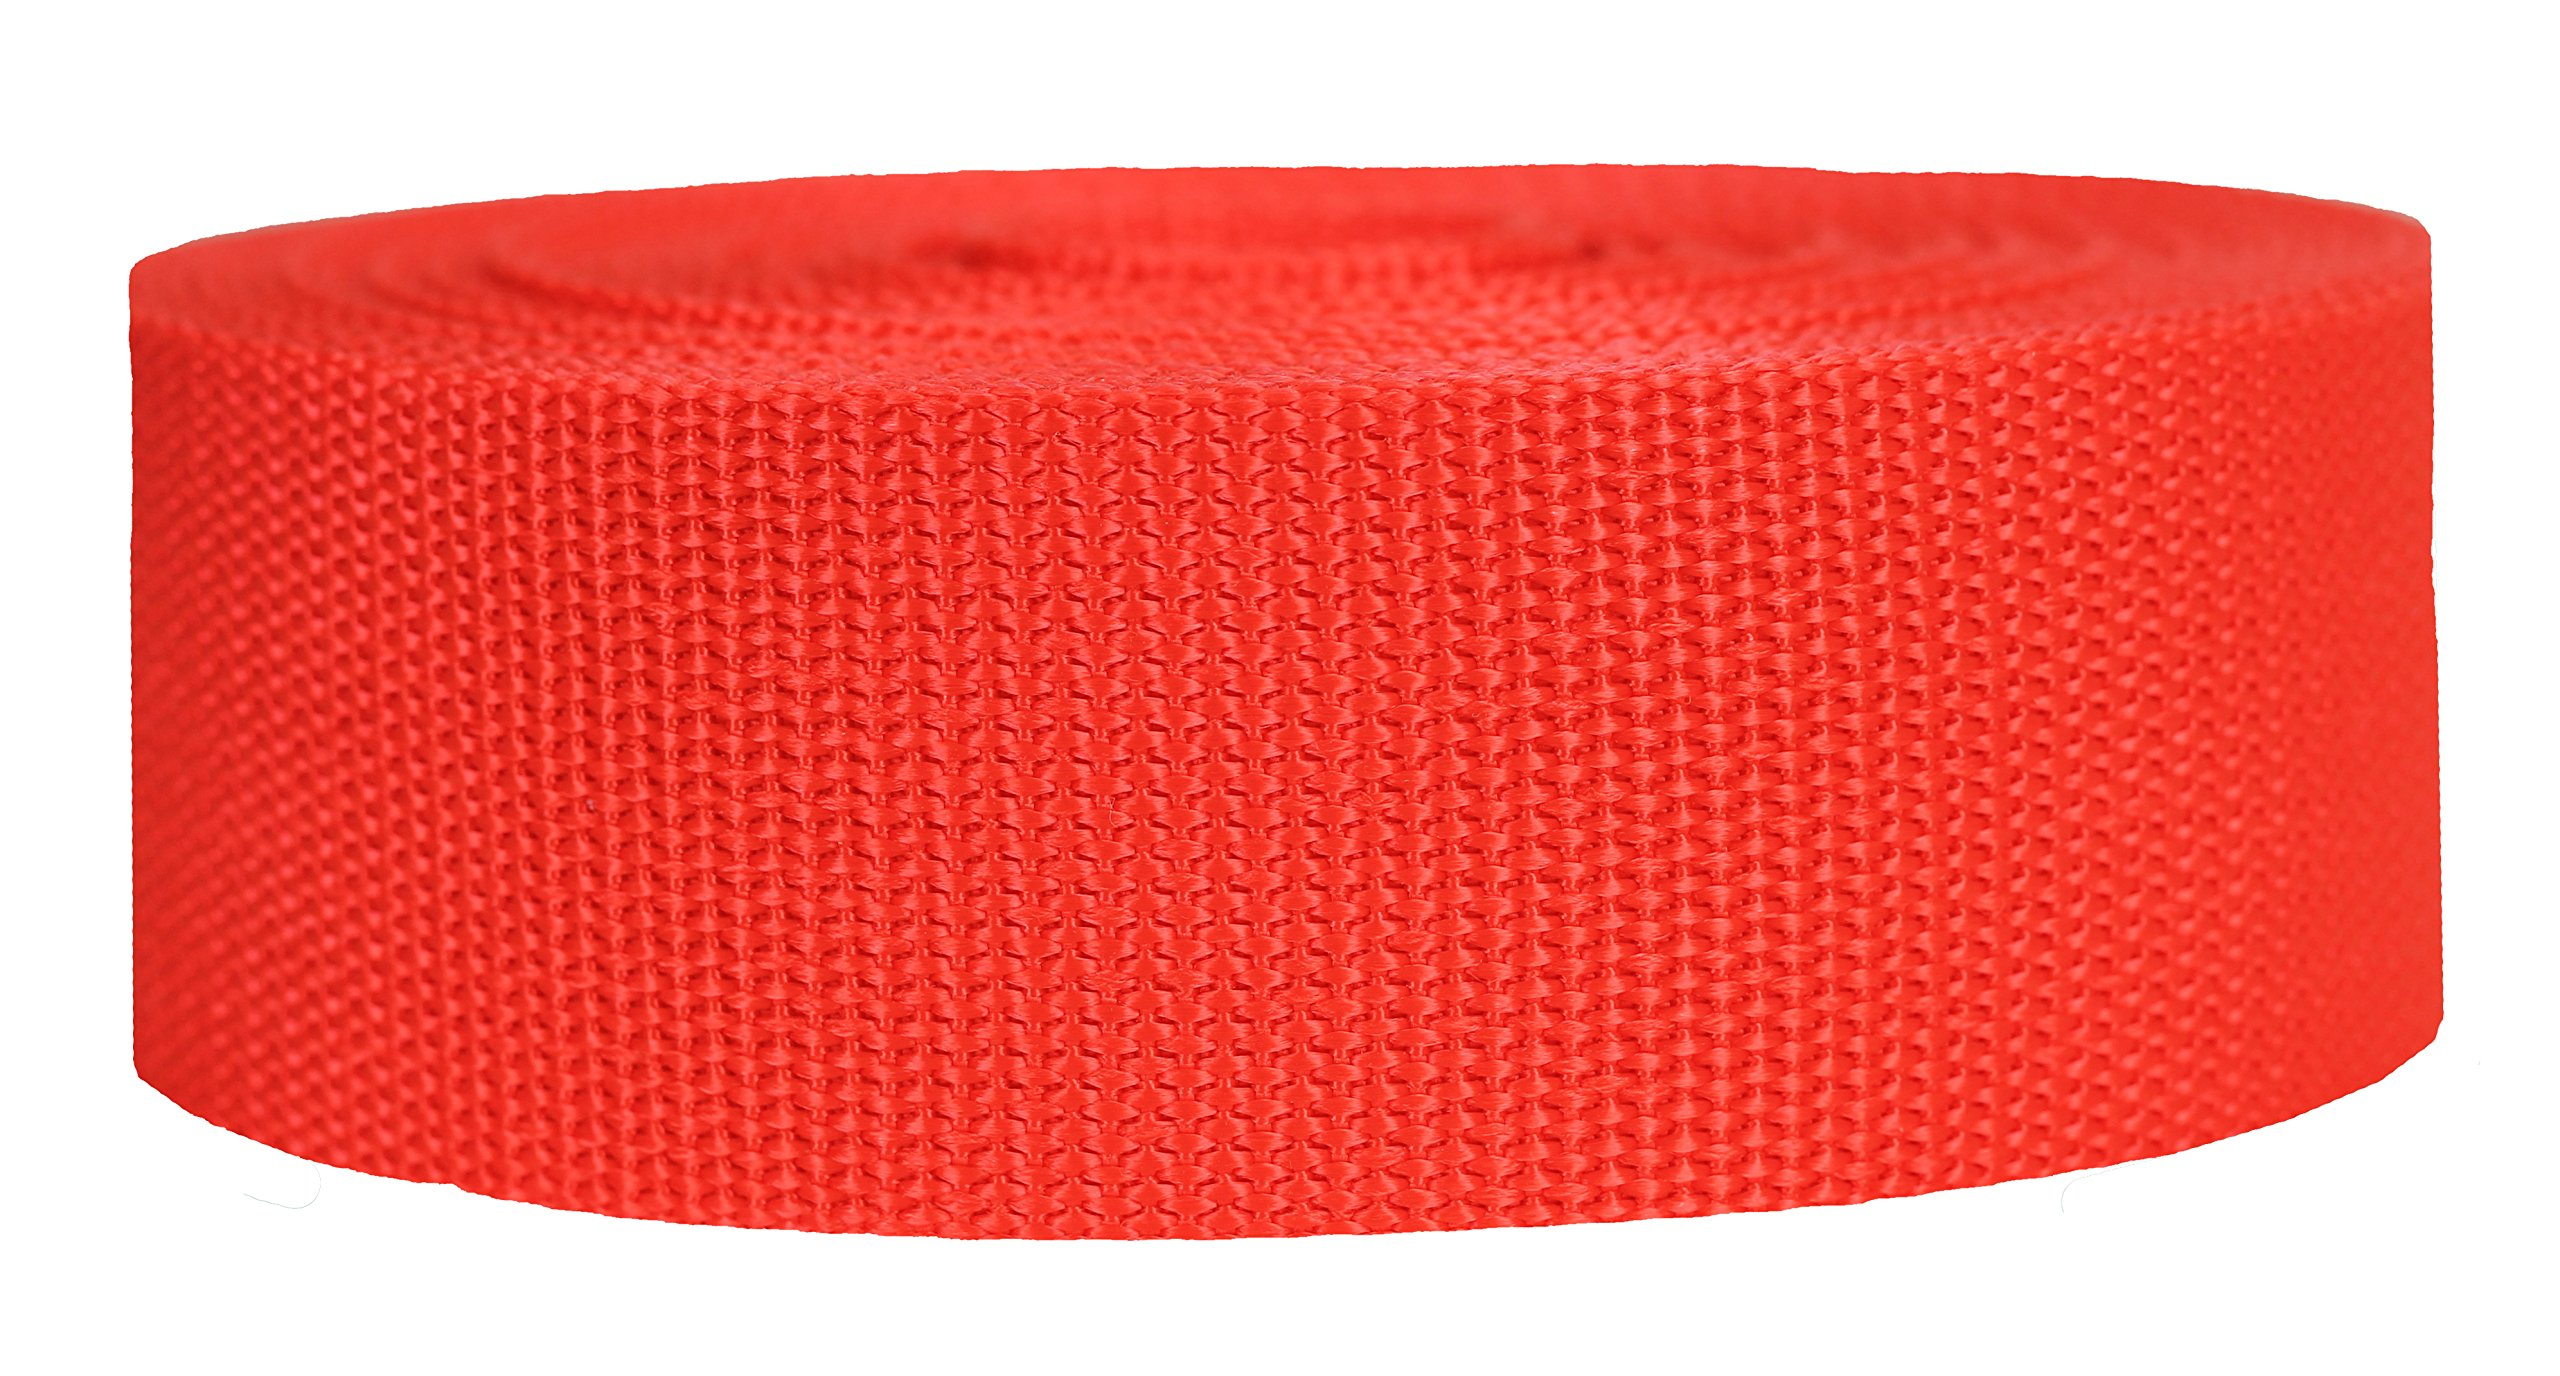 Strapworks Heavyweight Polypropylene Webbing - Heavy Duty Poly Strapping for Outdoor DIY Gear Repair, 2 Inch x 10 Yards - Blood Orange